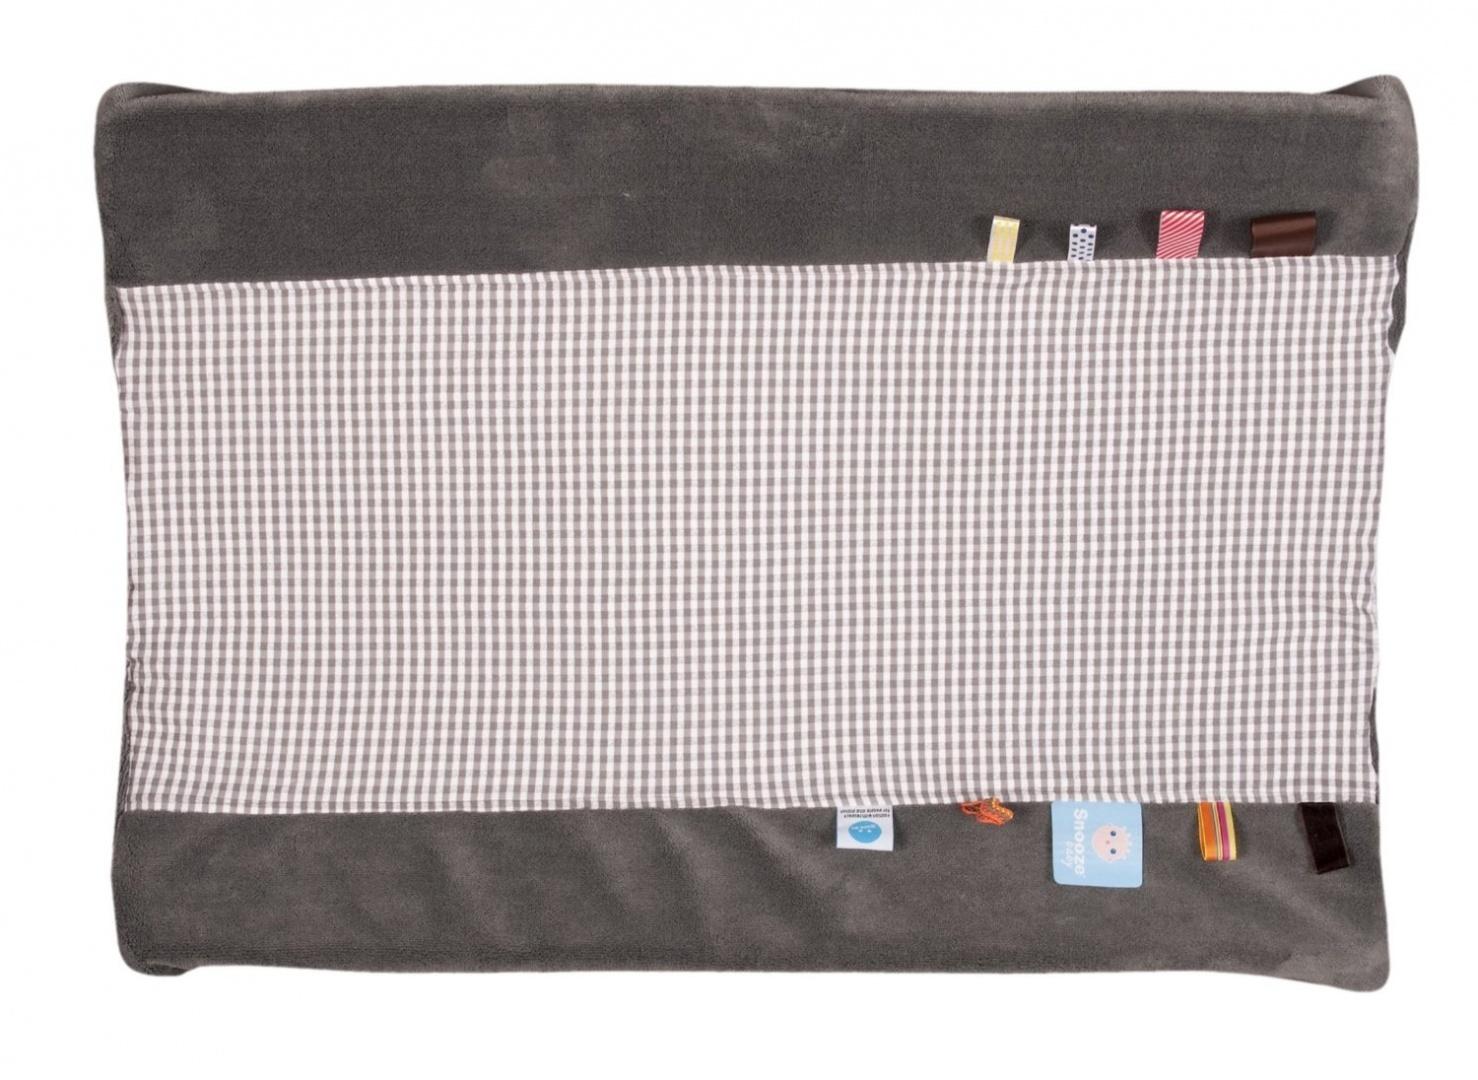 organic cotton waterproof newborn infant baby bassinet bedding mattress pads bed wet diaper cradle crib stroller - Bassinet Bedding